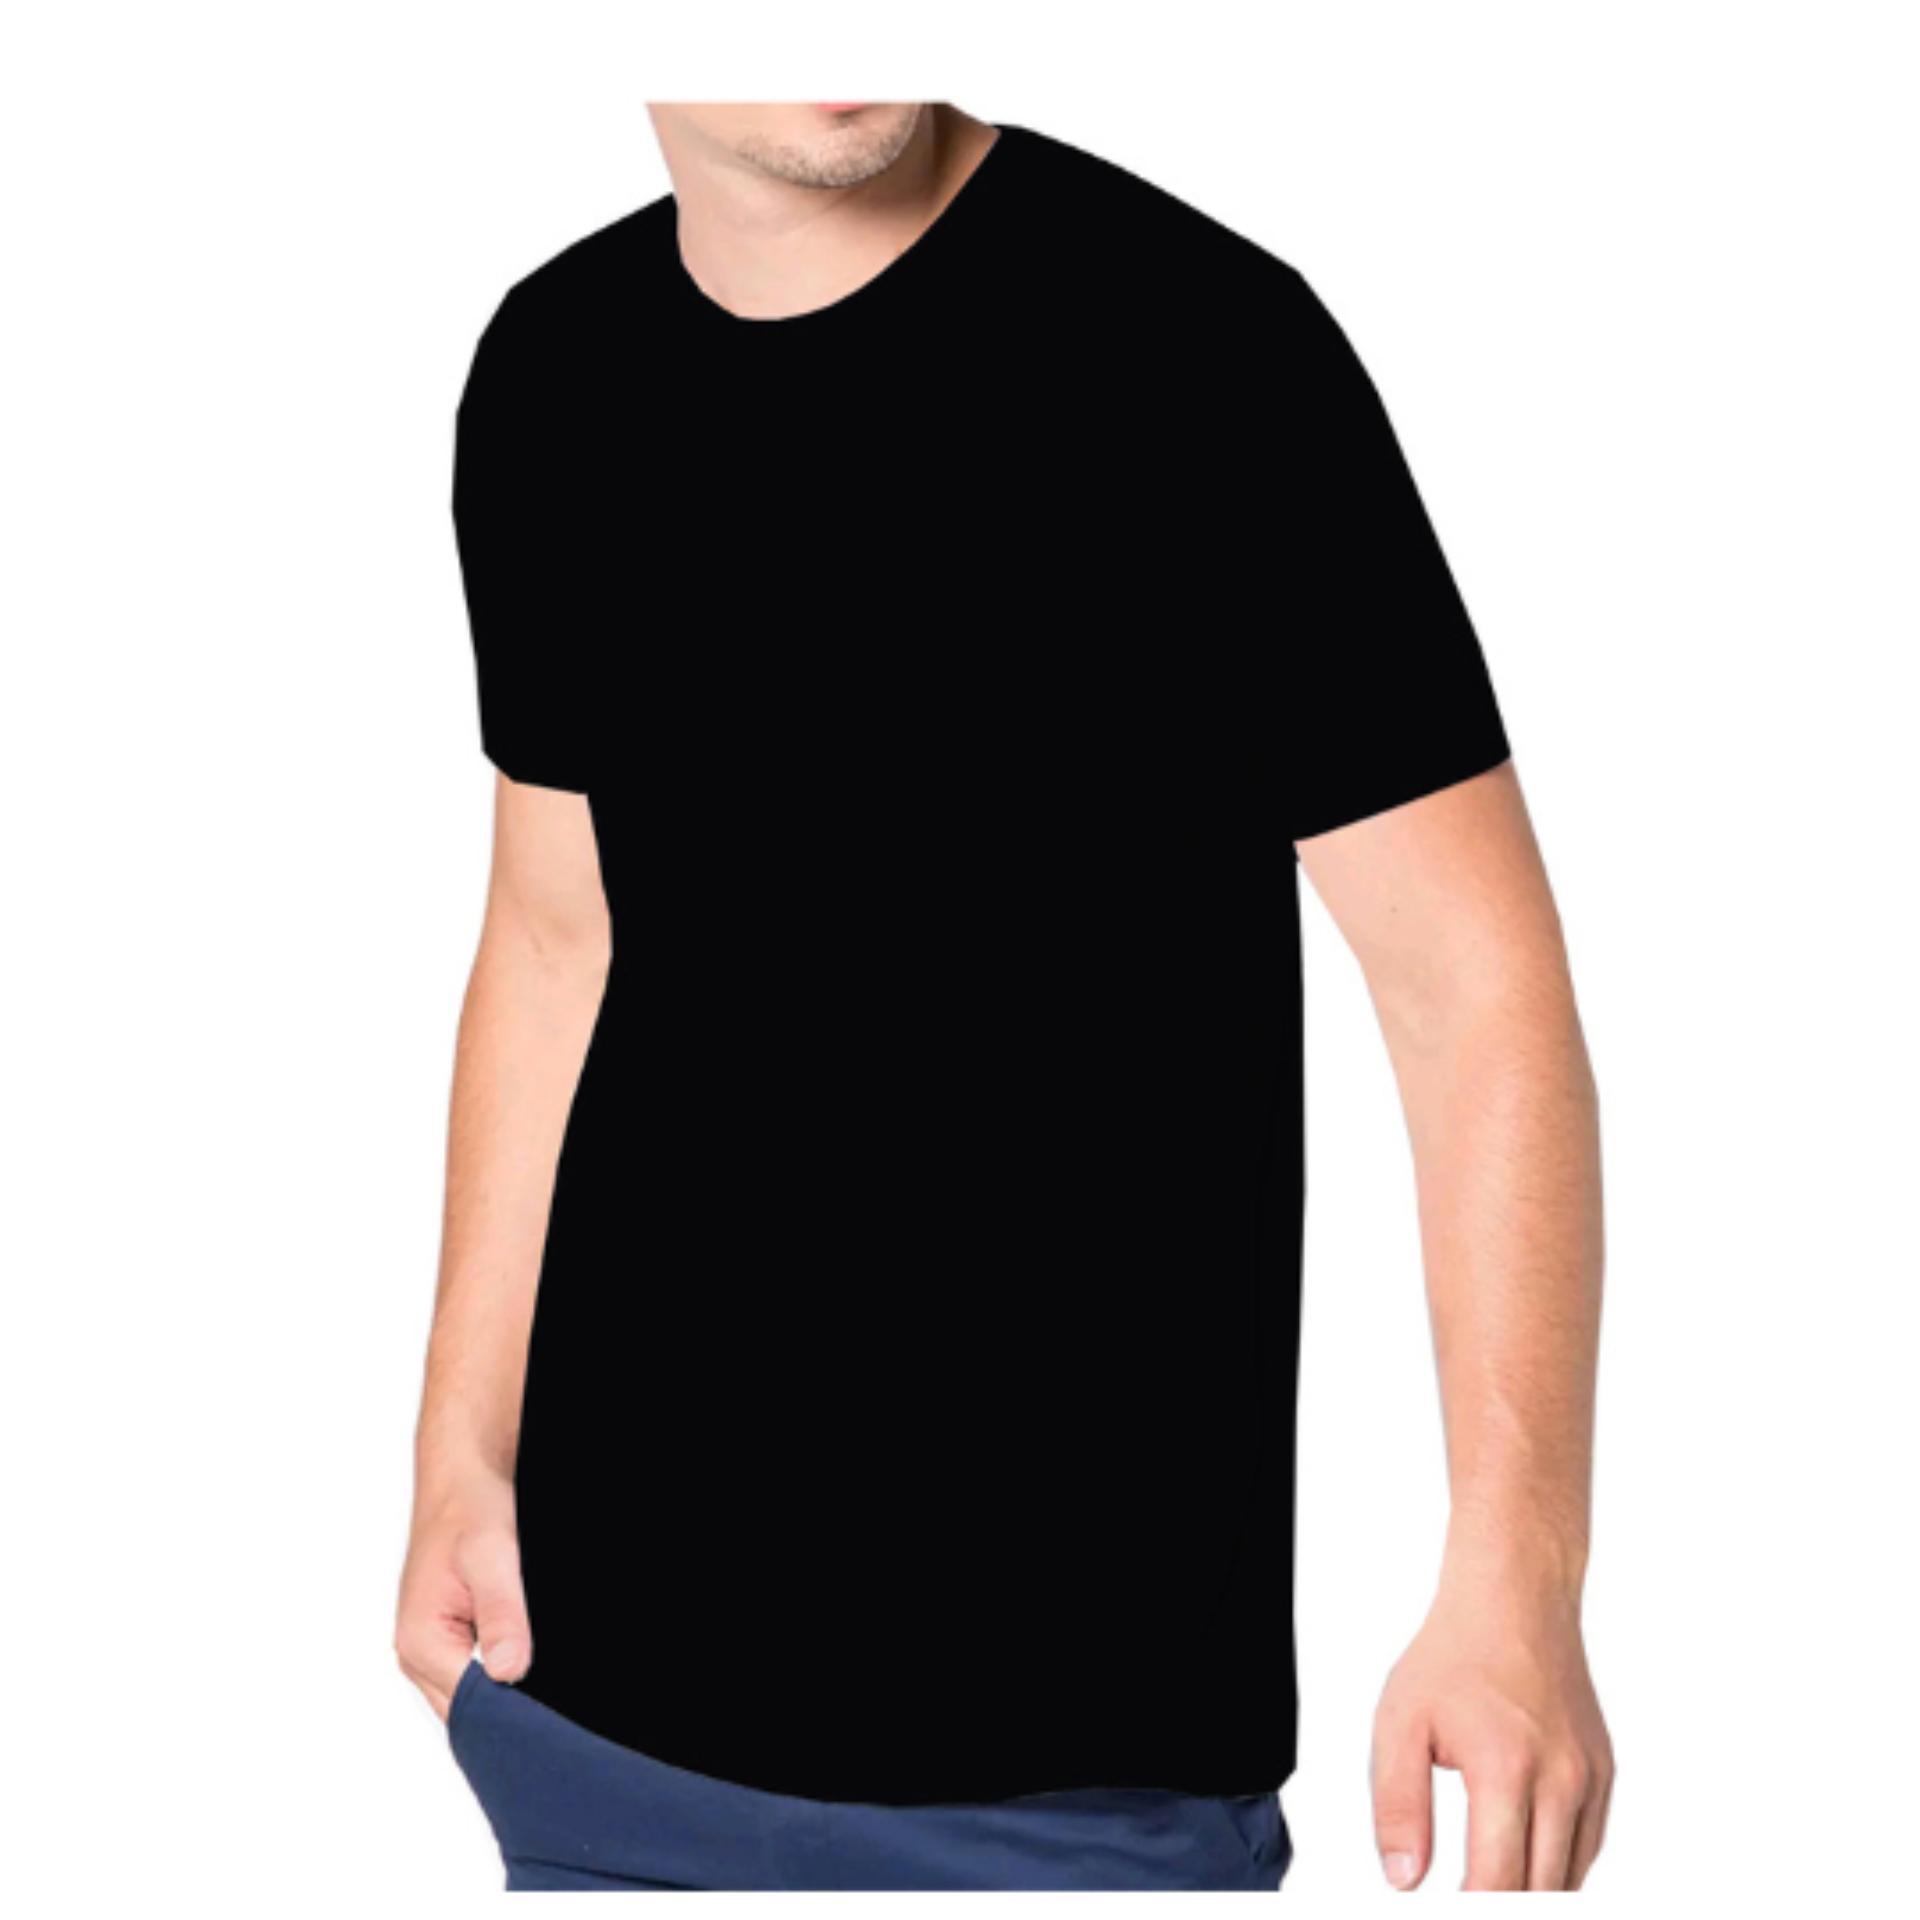 Irfan Store95 - Kaos Polos Pendek O Nenk - Hitam